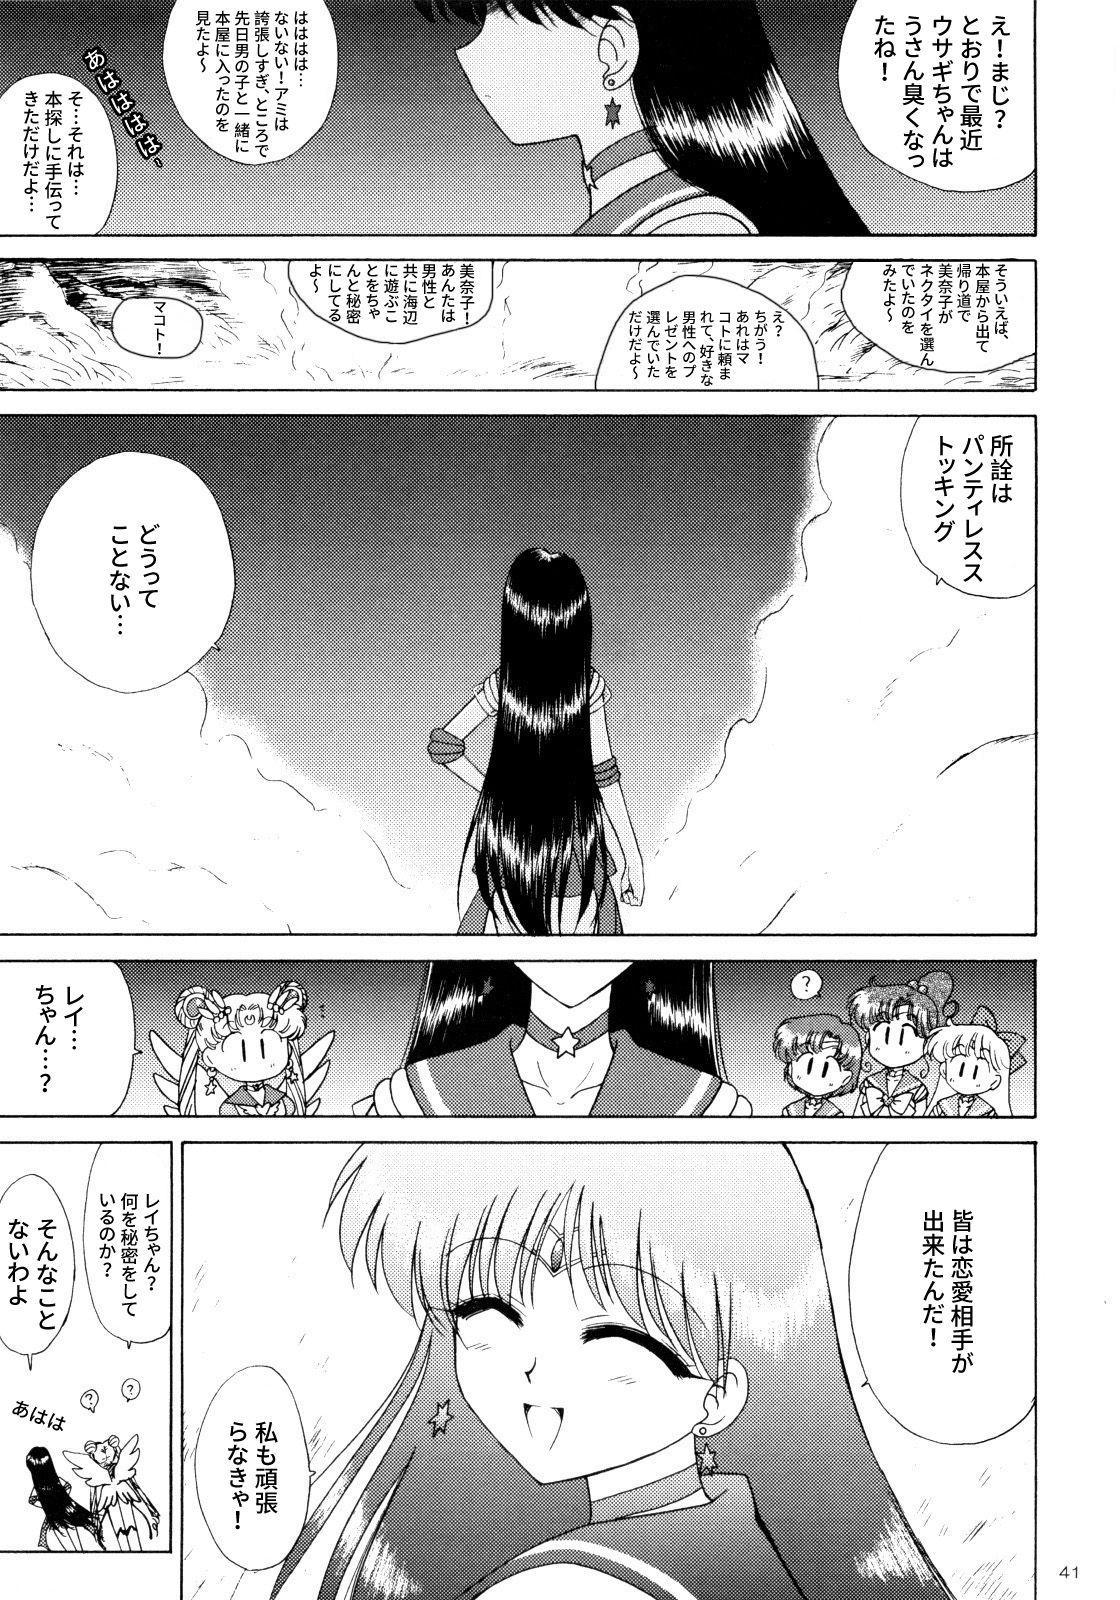 The Fertilization of Rei Hino 36